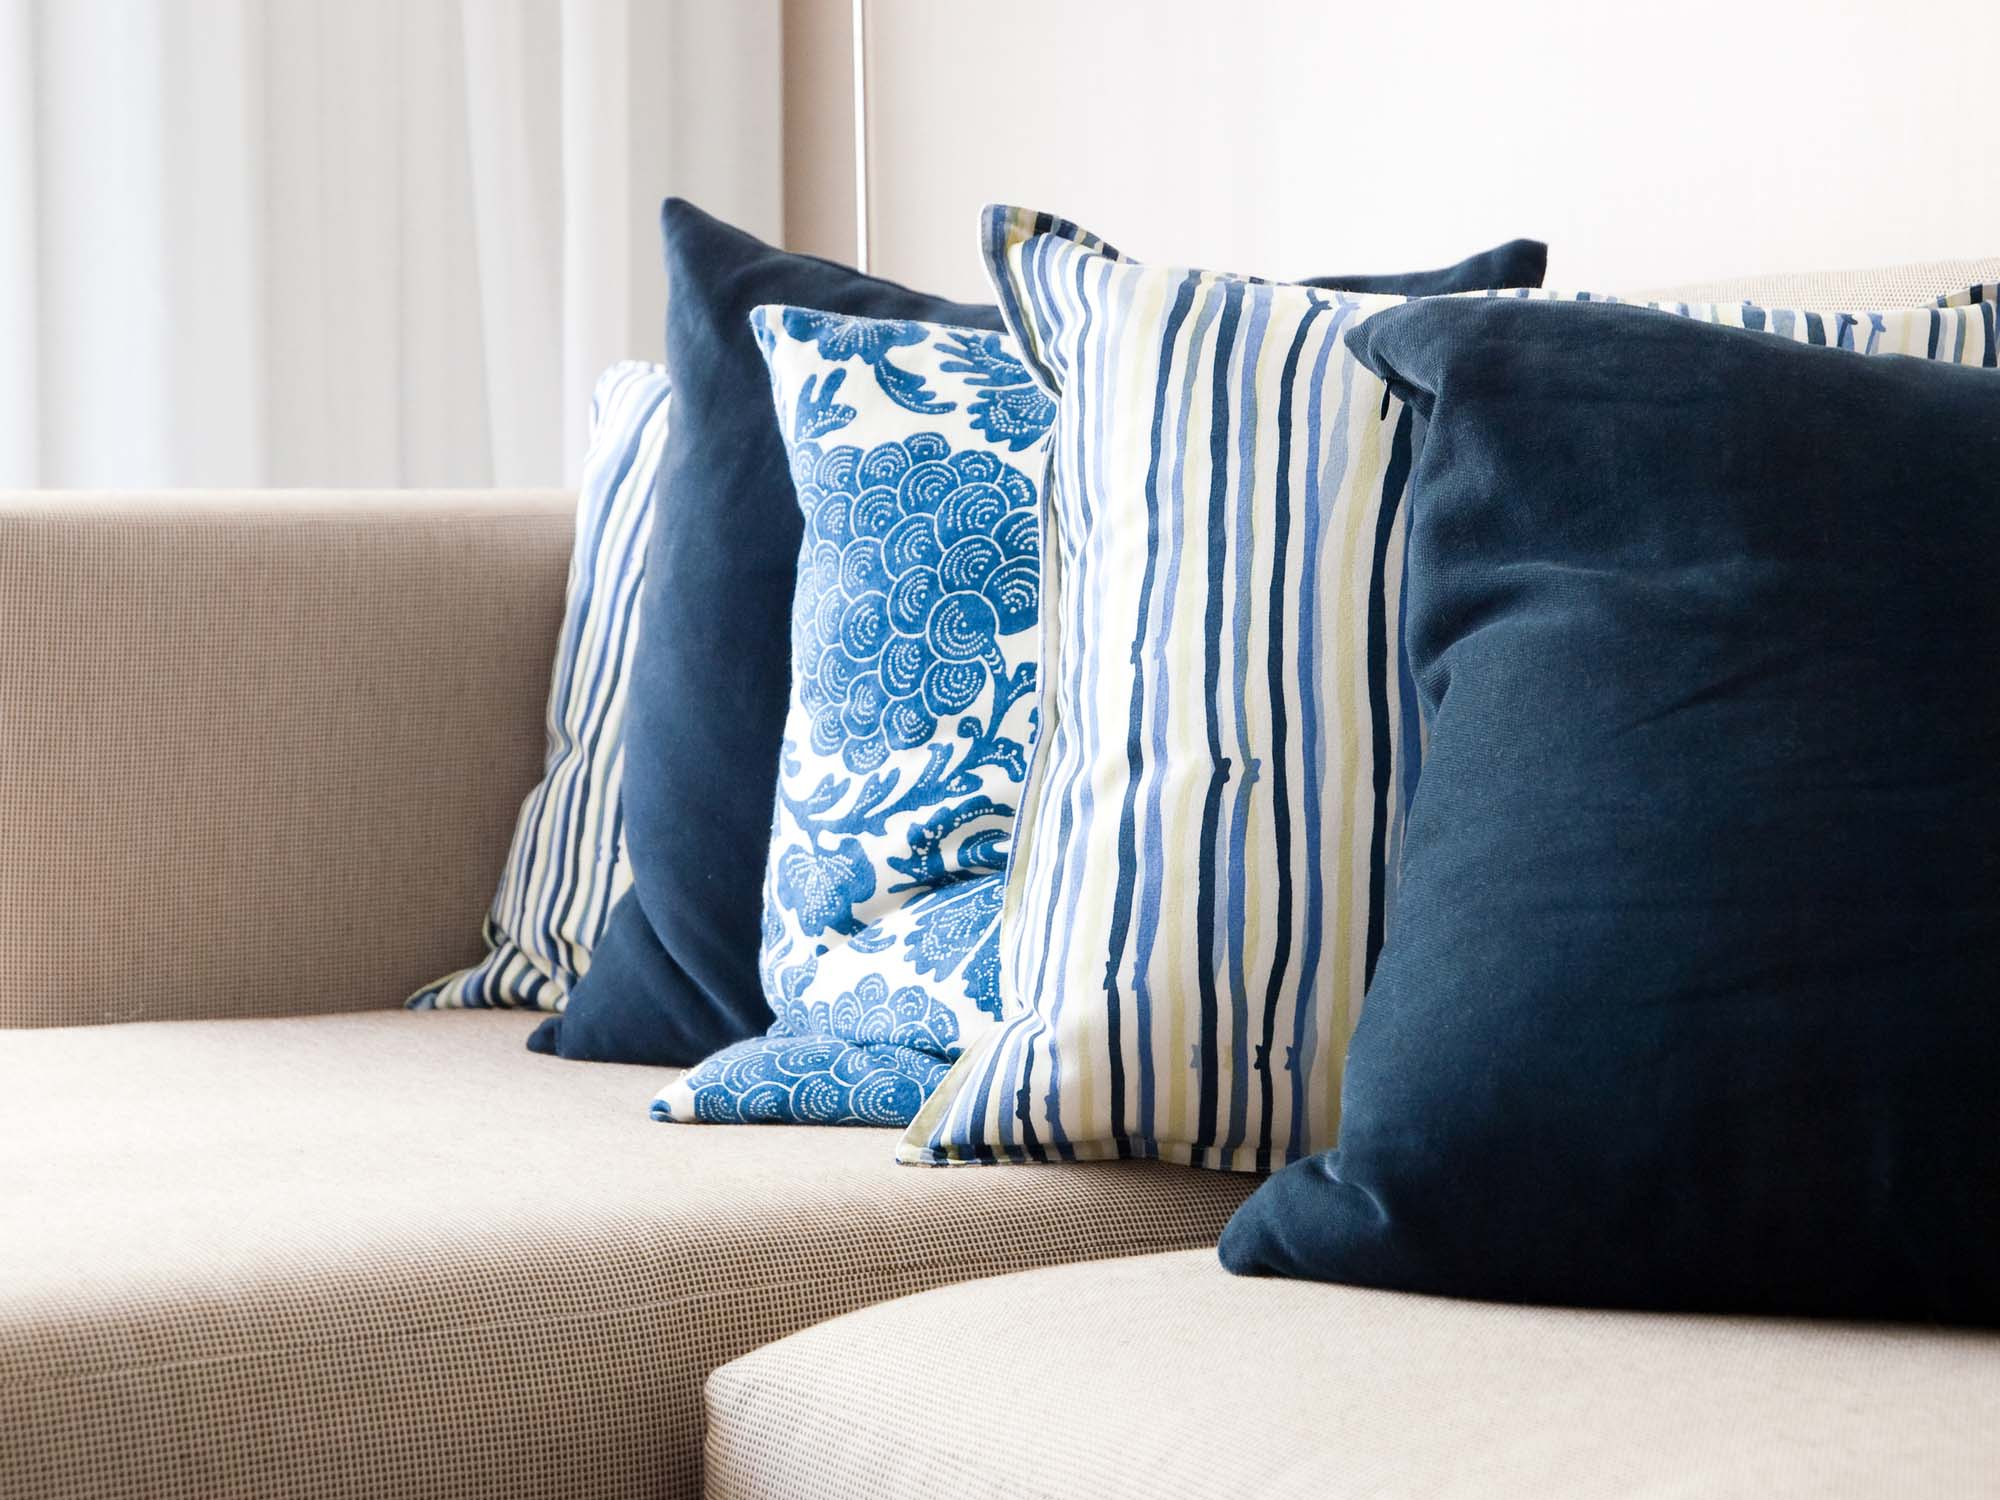 Blue pattern cushions on sofa